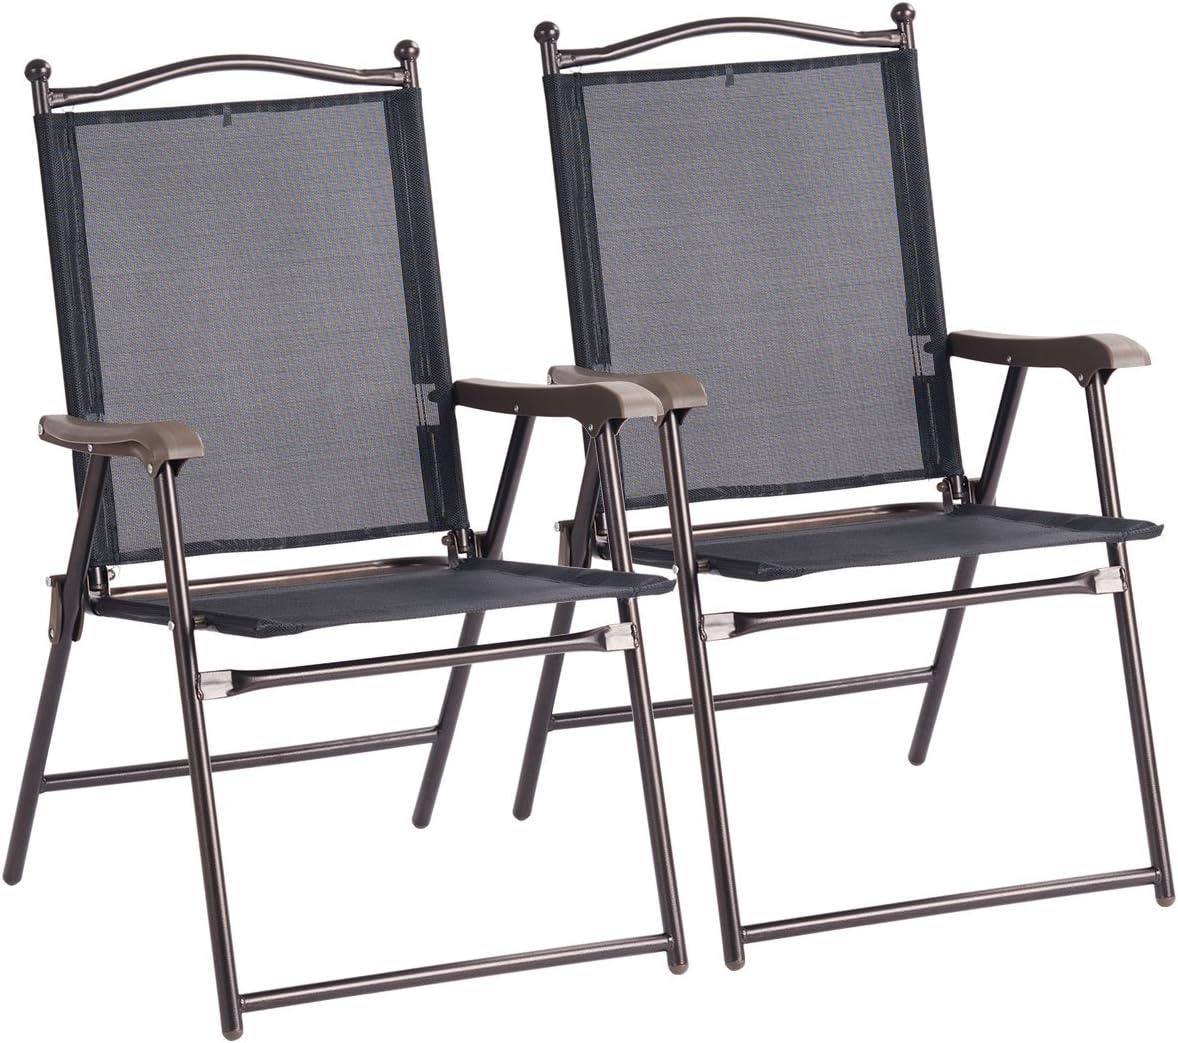 amazon com sling chairs patio lawn garden rh amazon com navy blue sling back chairs